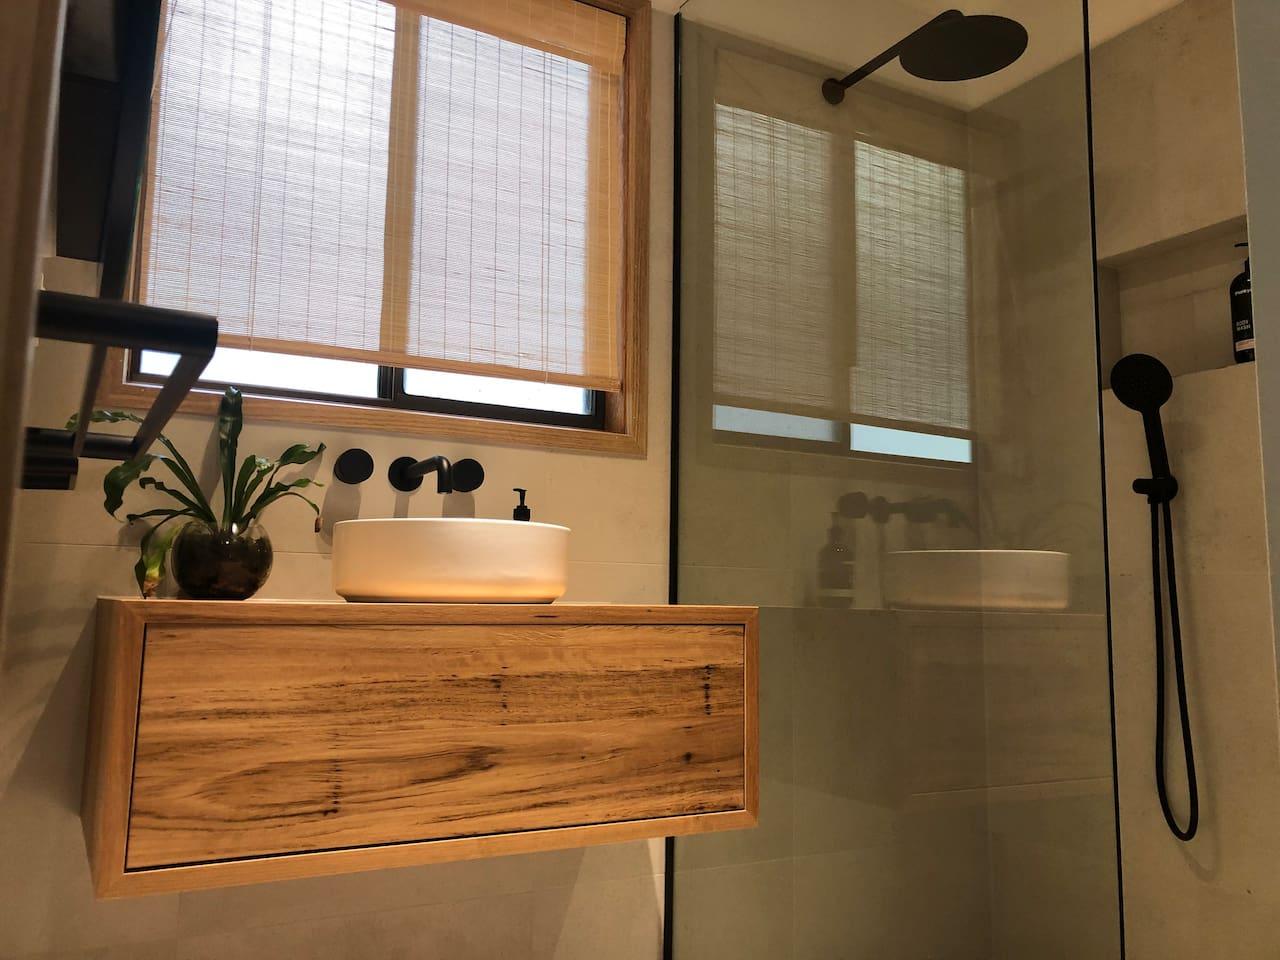 Luxurious brand new bathroom